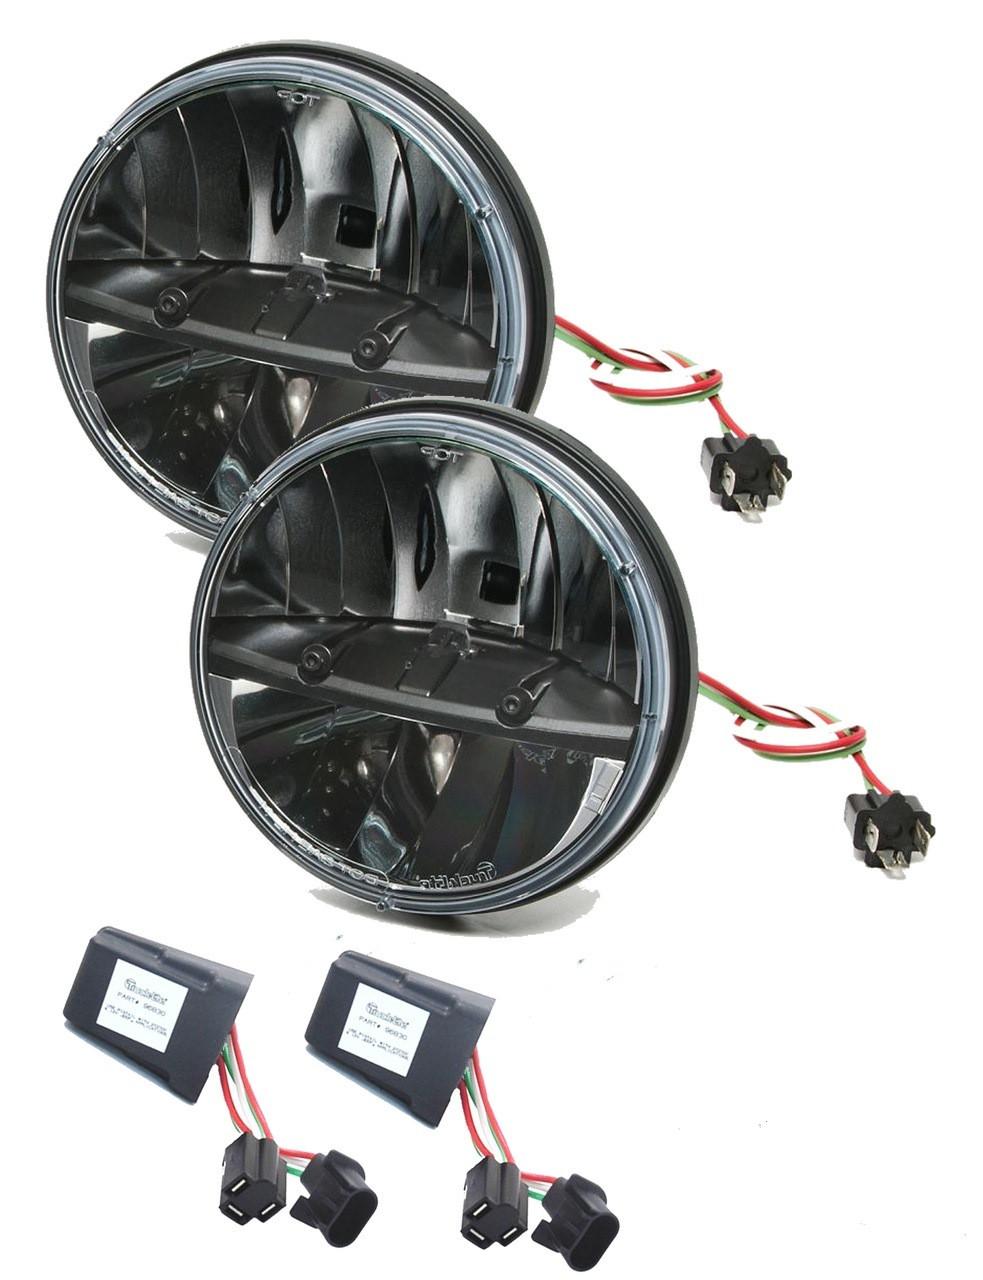 hight resolution of truck lite 27270c jeep jk kit 7 round led headlight pair anti flicker harness